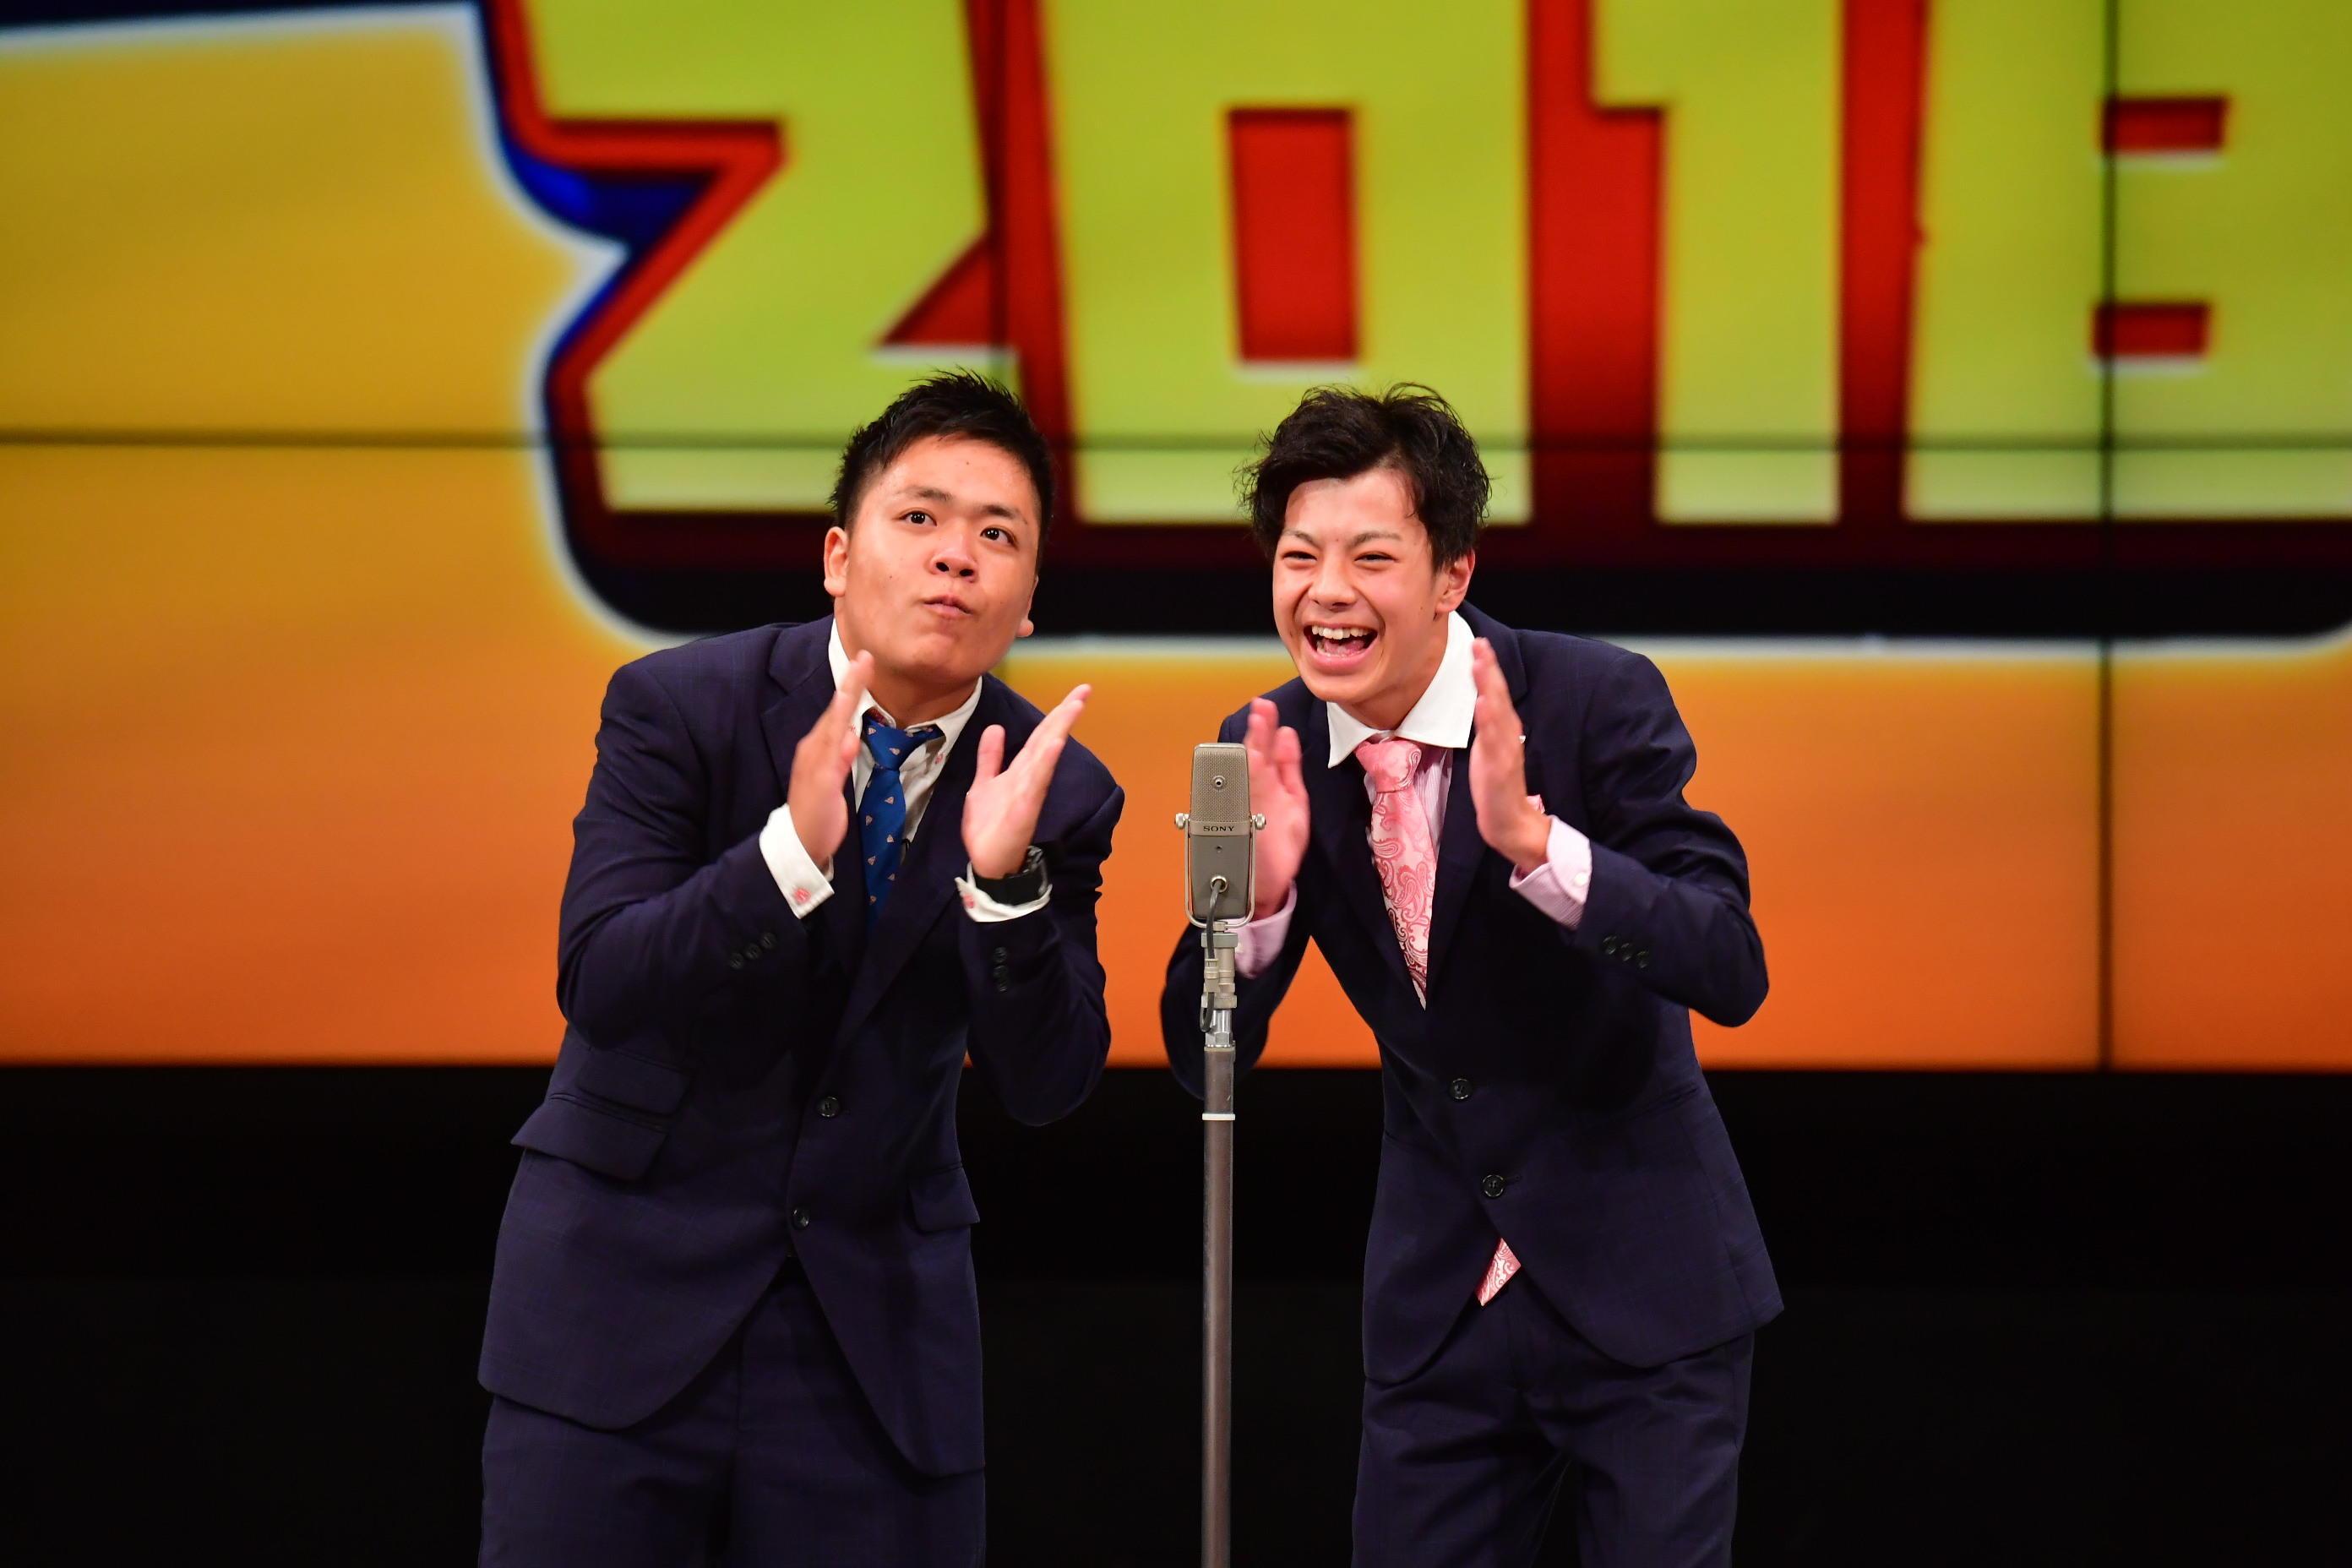 http://news.yoshimoto.co.jp/20180902232318-ae9b336a3a67145f9267cd664e57314750de3e86.jpg